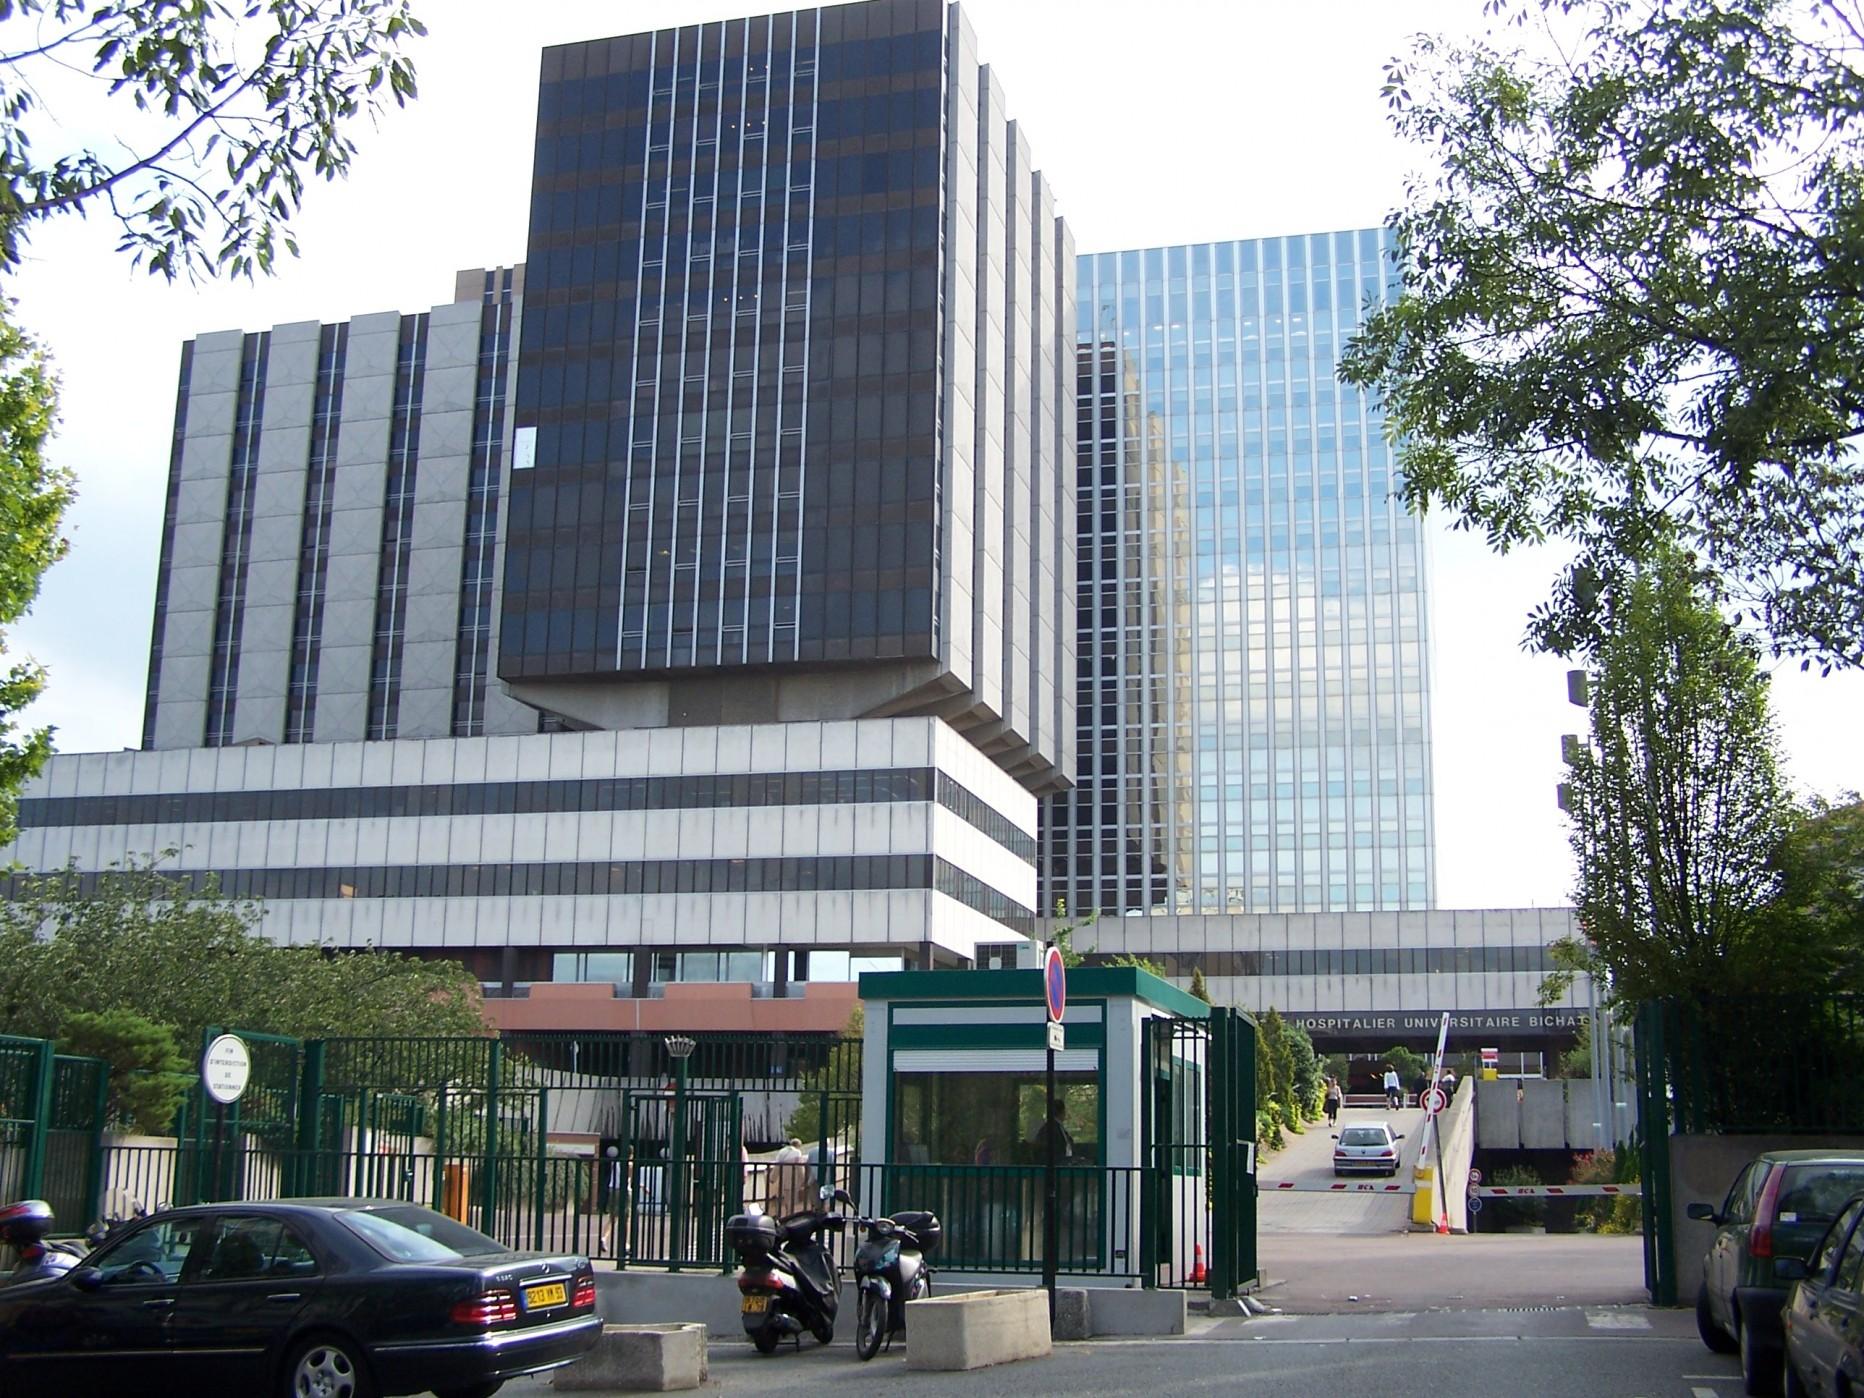 Hôpital Bichat-Claude Bernard